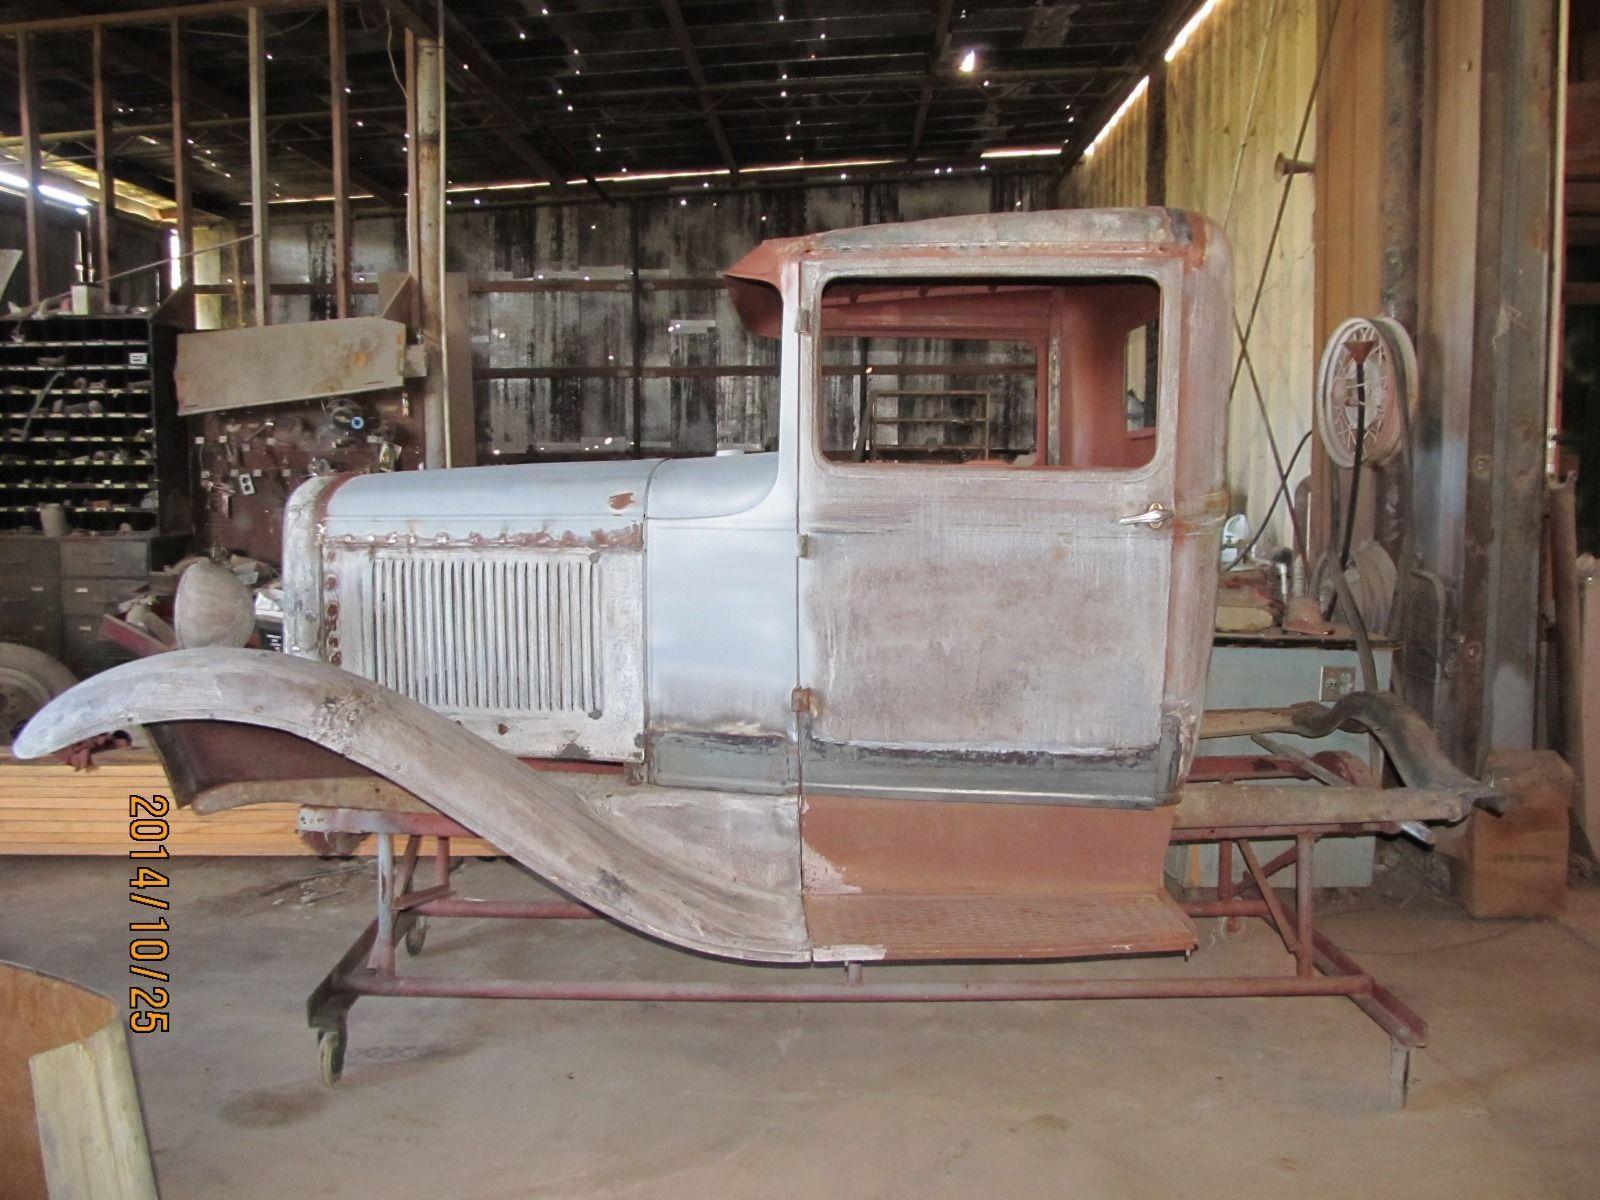 1930 1931 30 31 Ford Model A pick up pu truck eBay